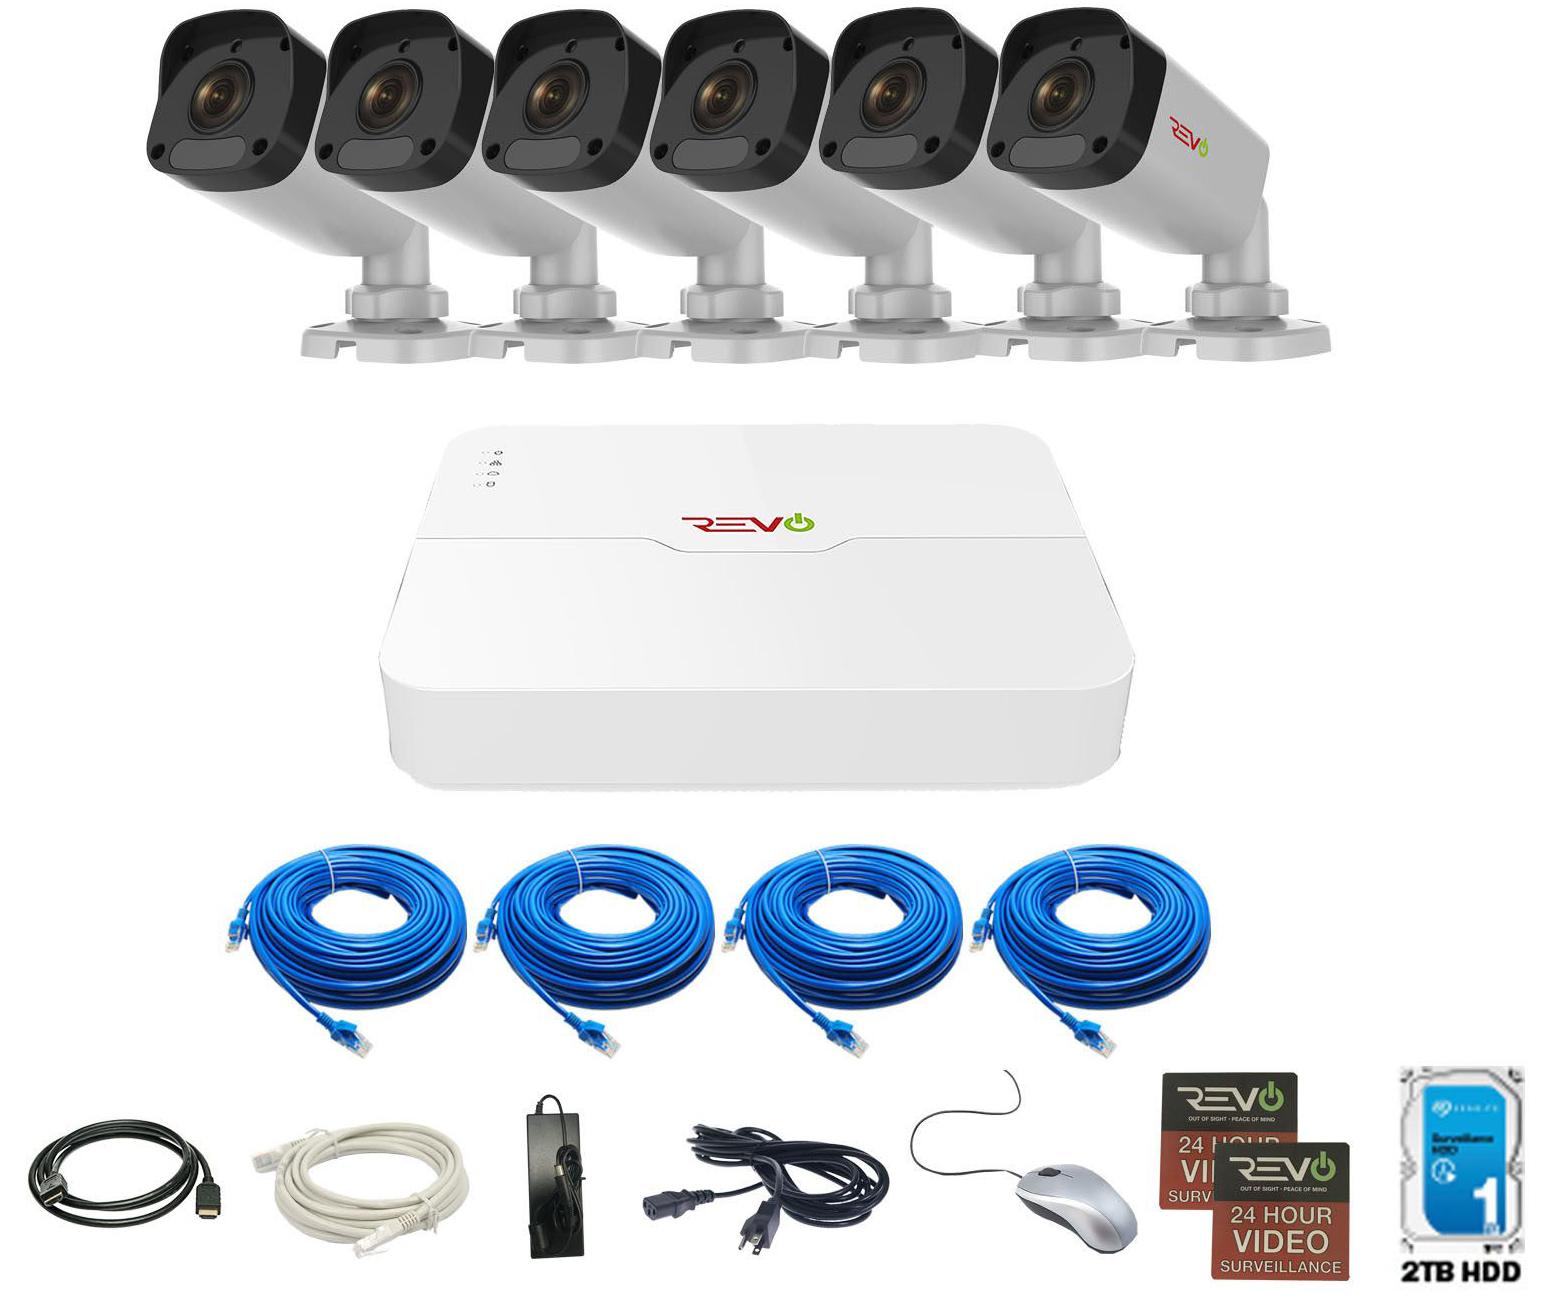 REVO ULTRA 8CH IP Video Surveillance System, 8 CH 4K NVR, 2TB HDD, 6x 4 Megapixel Indoor/Outdoor IR Bullet Cameras - Remote Access via Smart Phone, Tablet, PC & MAC